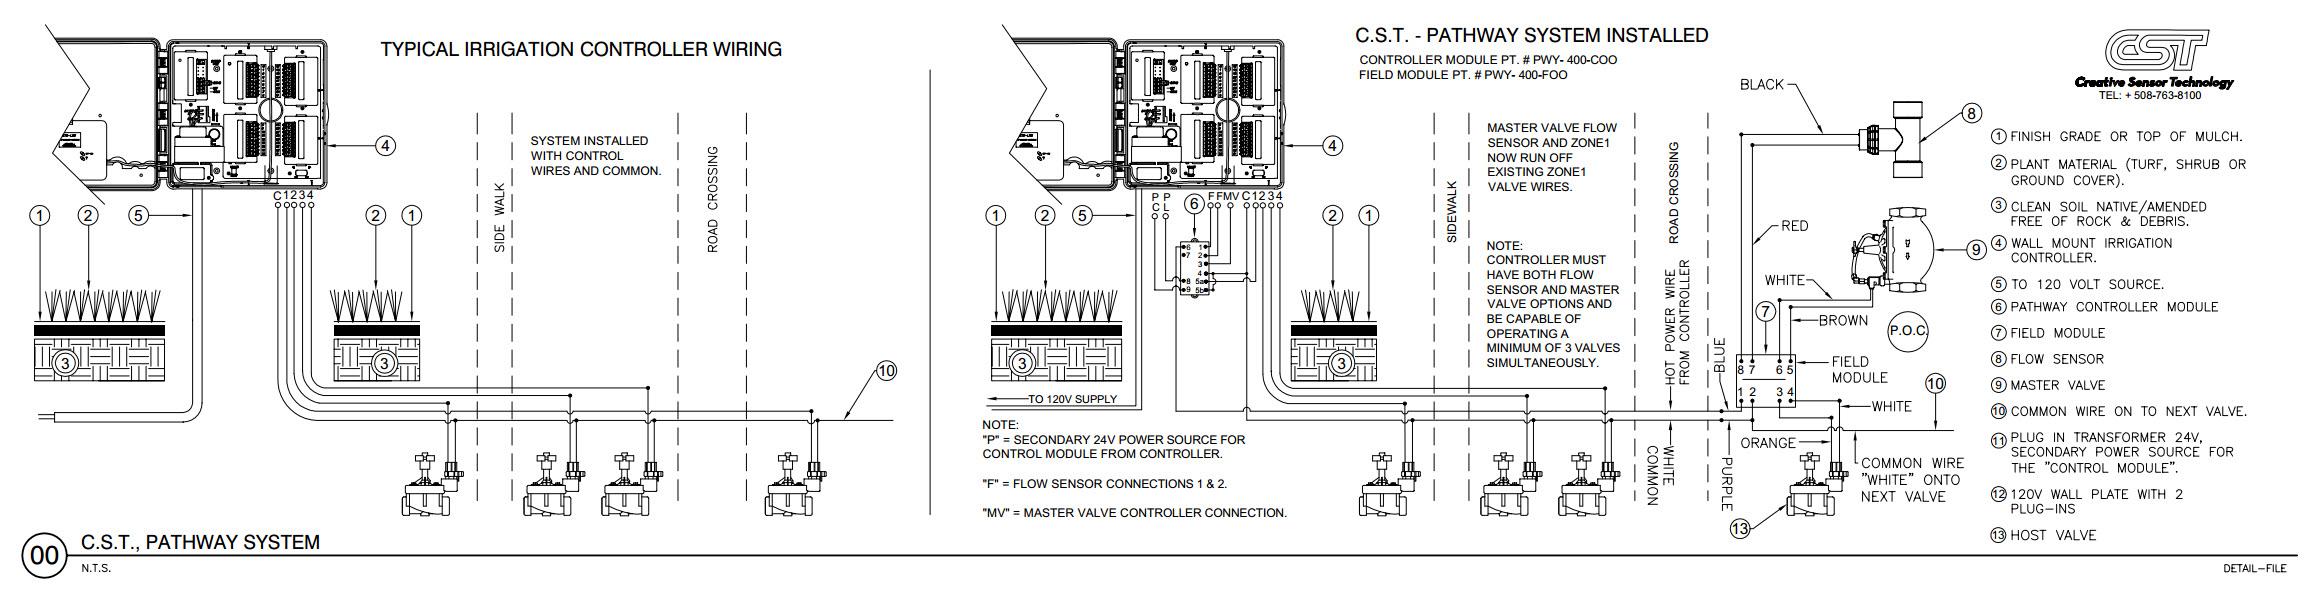 Esp Wiring Picture Simple Electrical Diagram York Diamond 80 Furnace Fan Natural Rain Bird Modular Source Rh